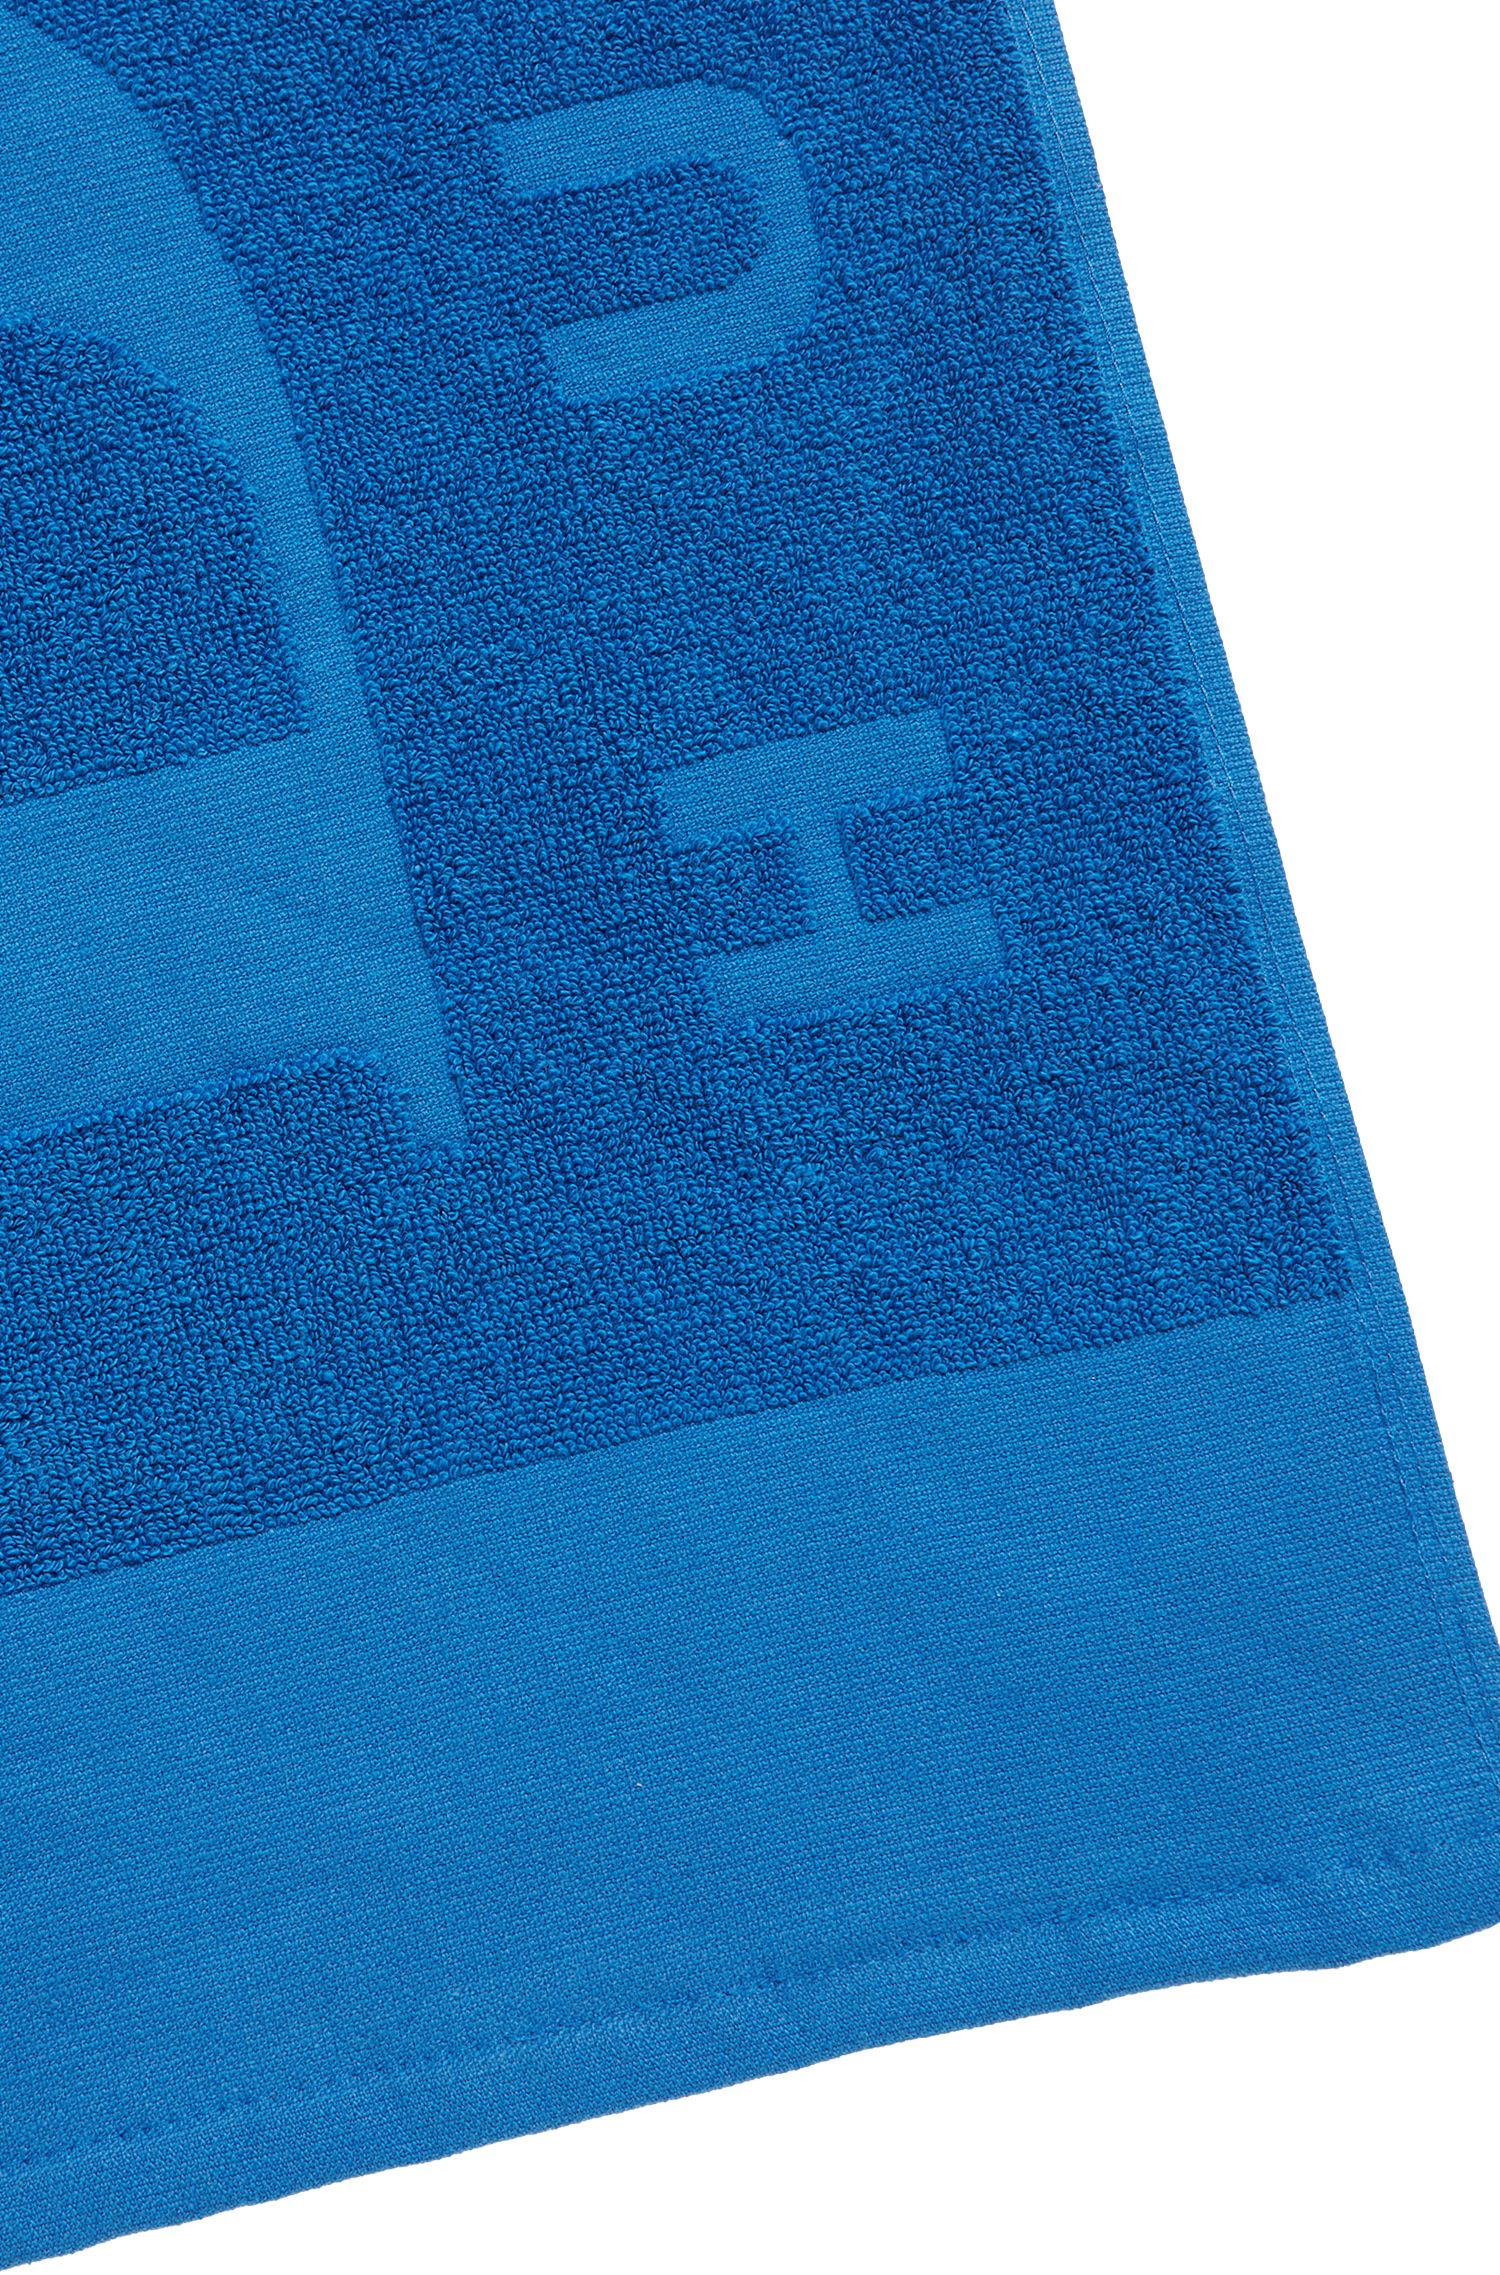 Badetuch aus softem Baumwoll-Jacquard mit Logo, Blau